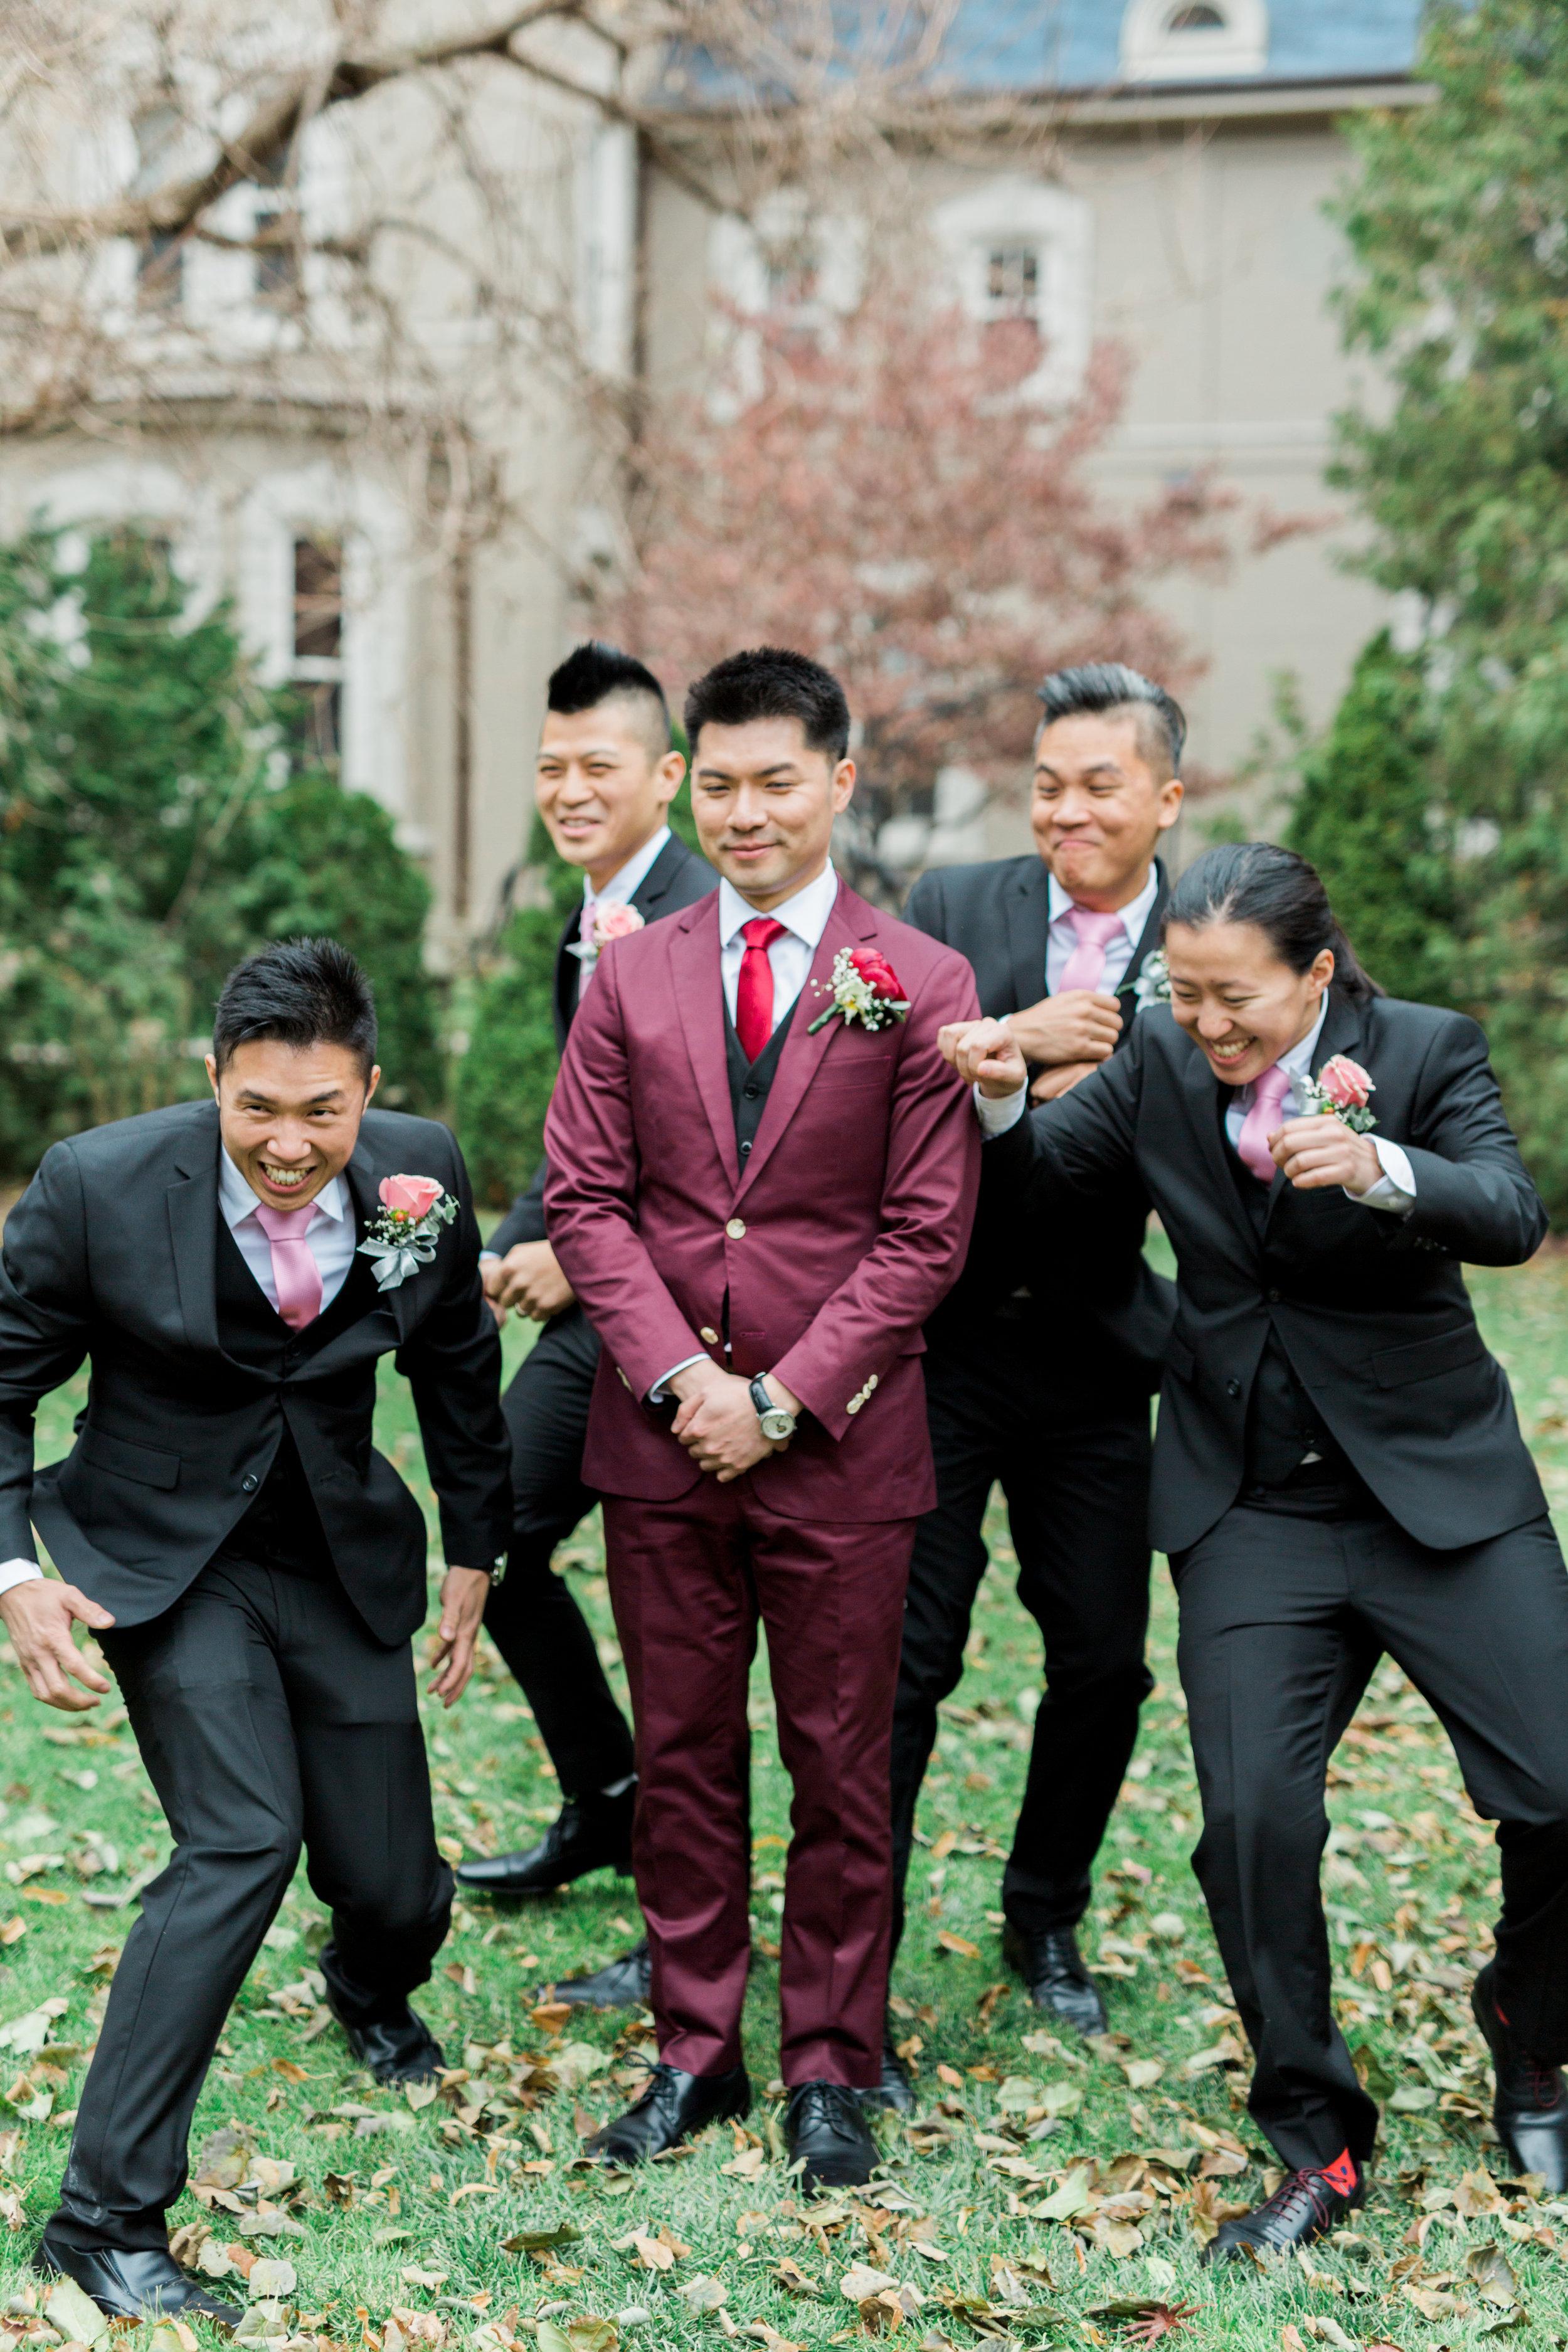 Parkview Manor Wedding - Bridal Portraits-33.jpg